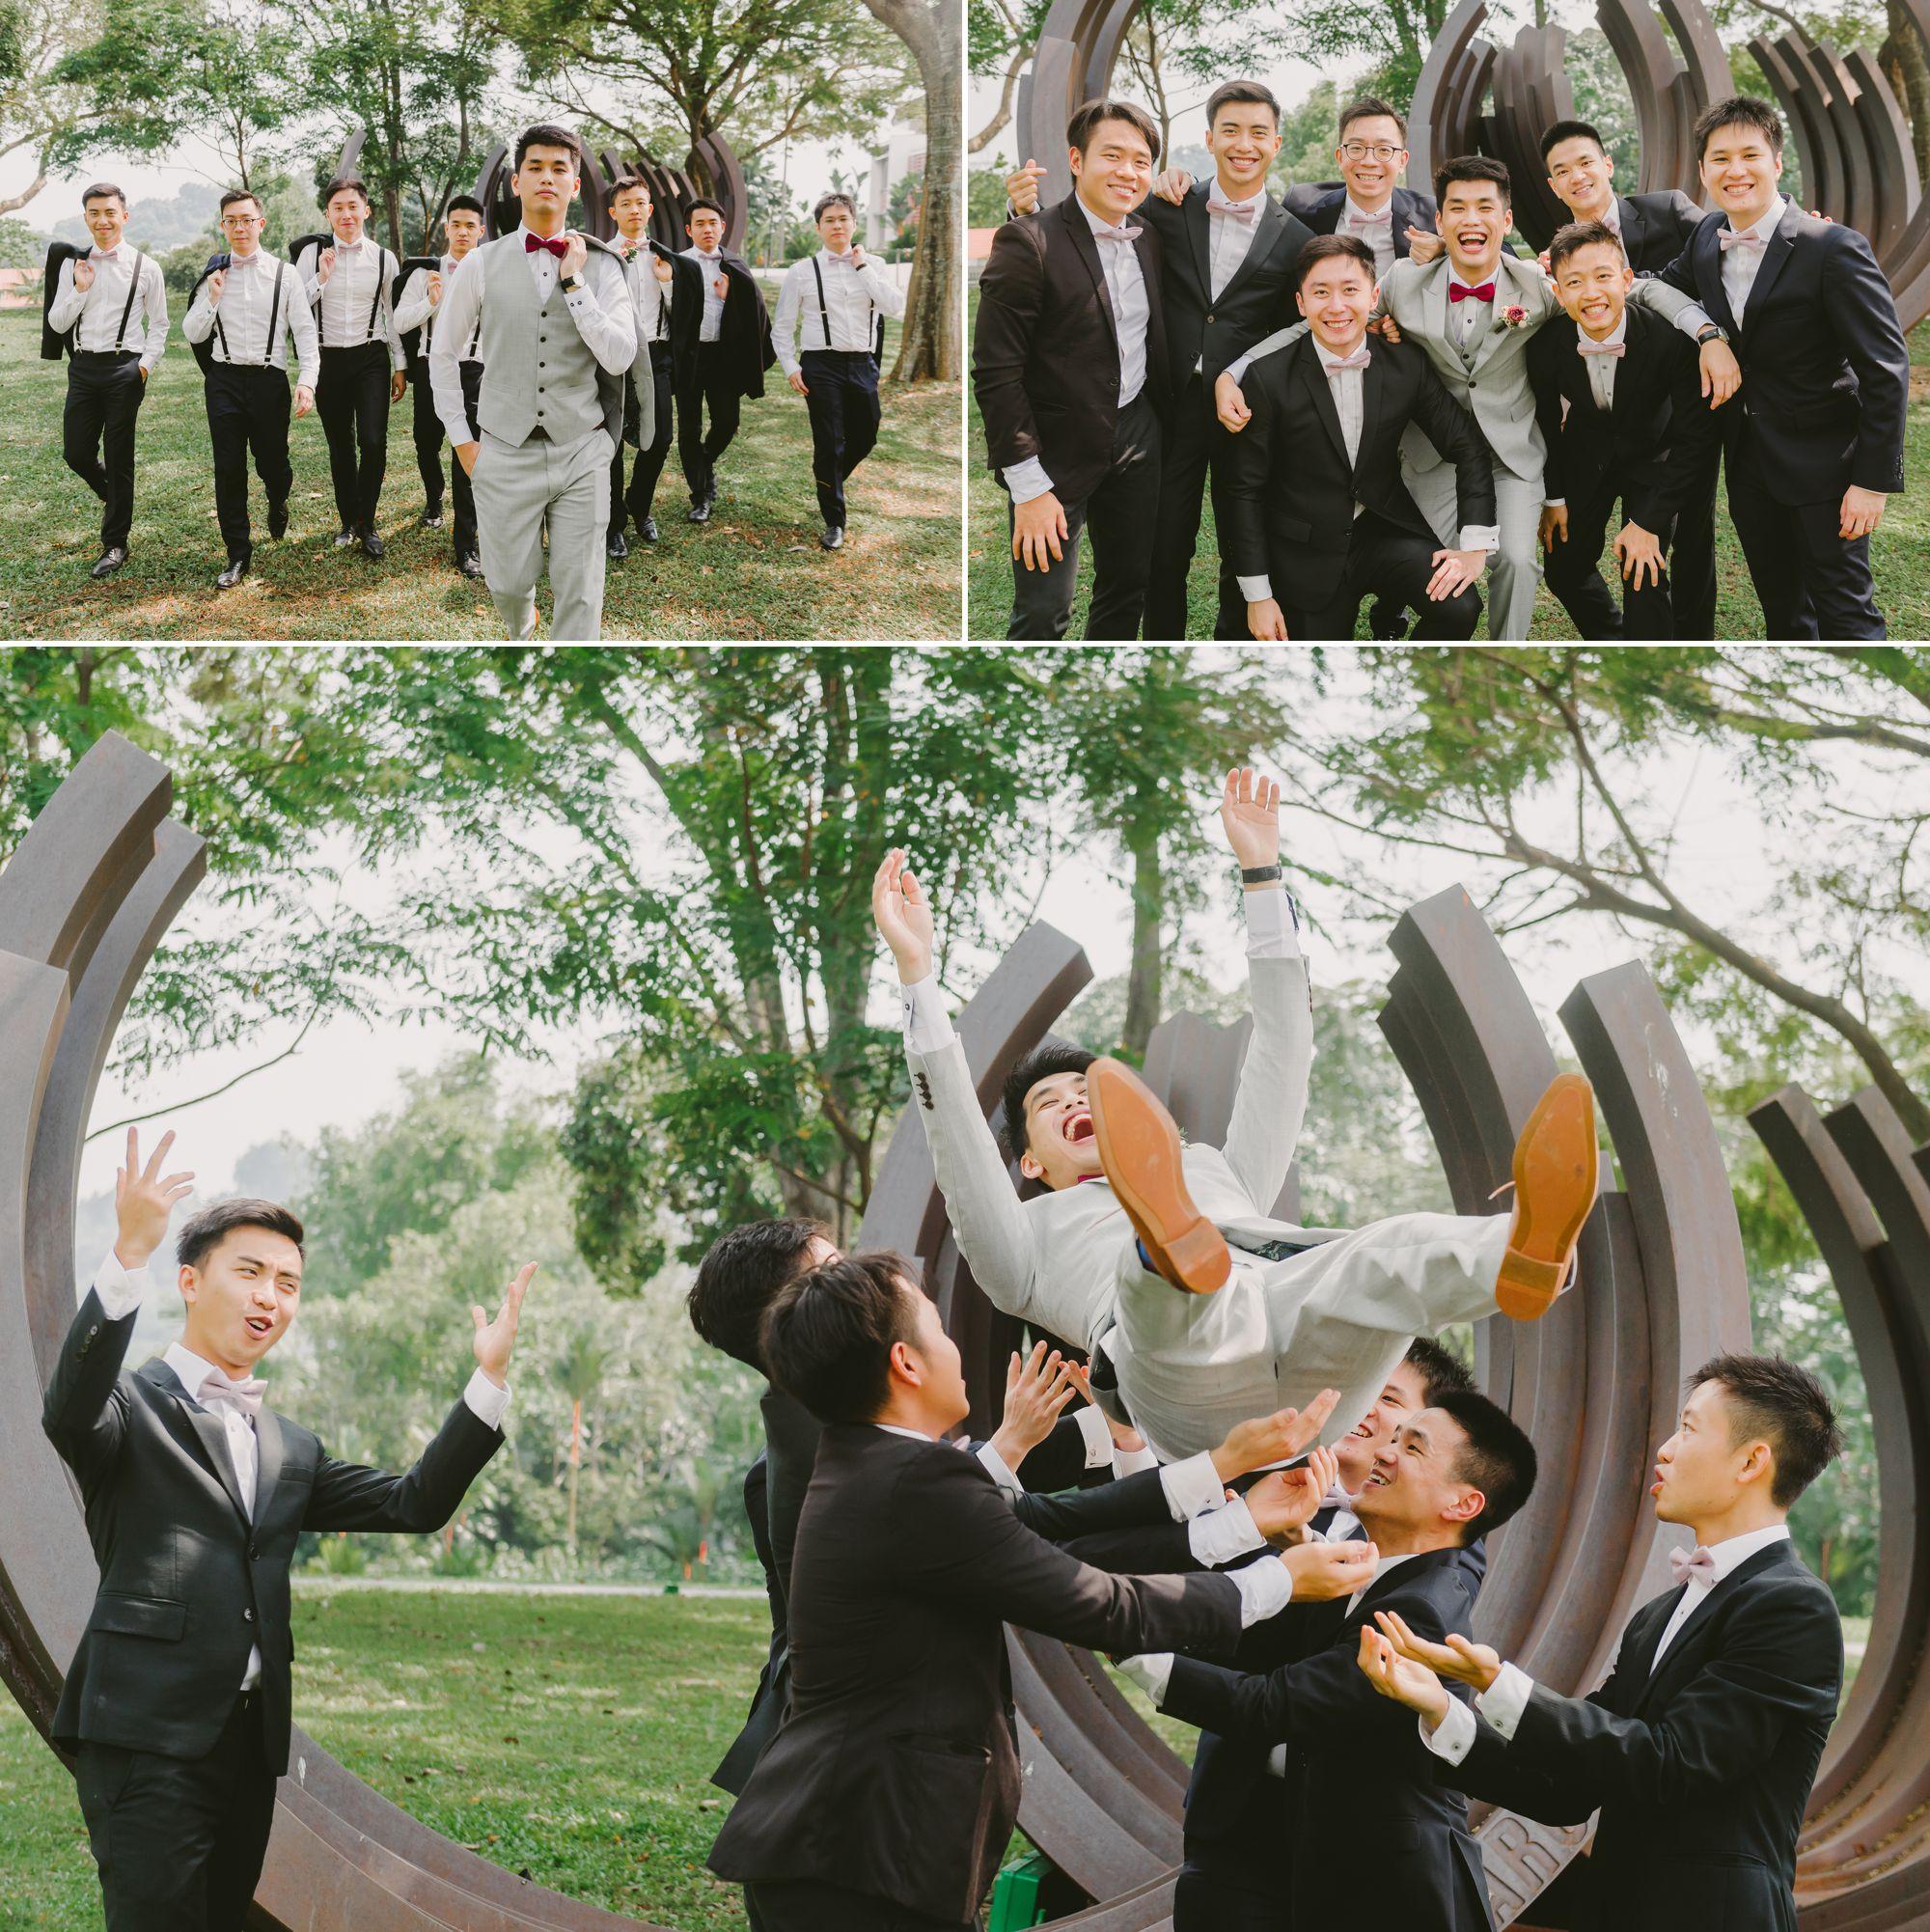 capella_wedding_photography_ 22.jpg